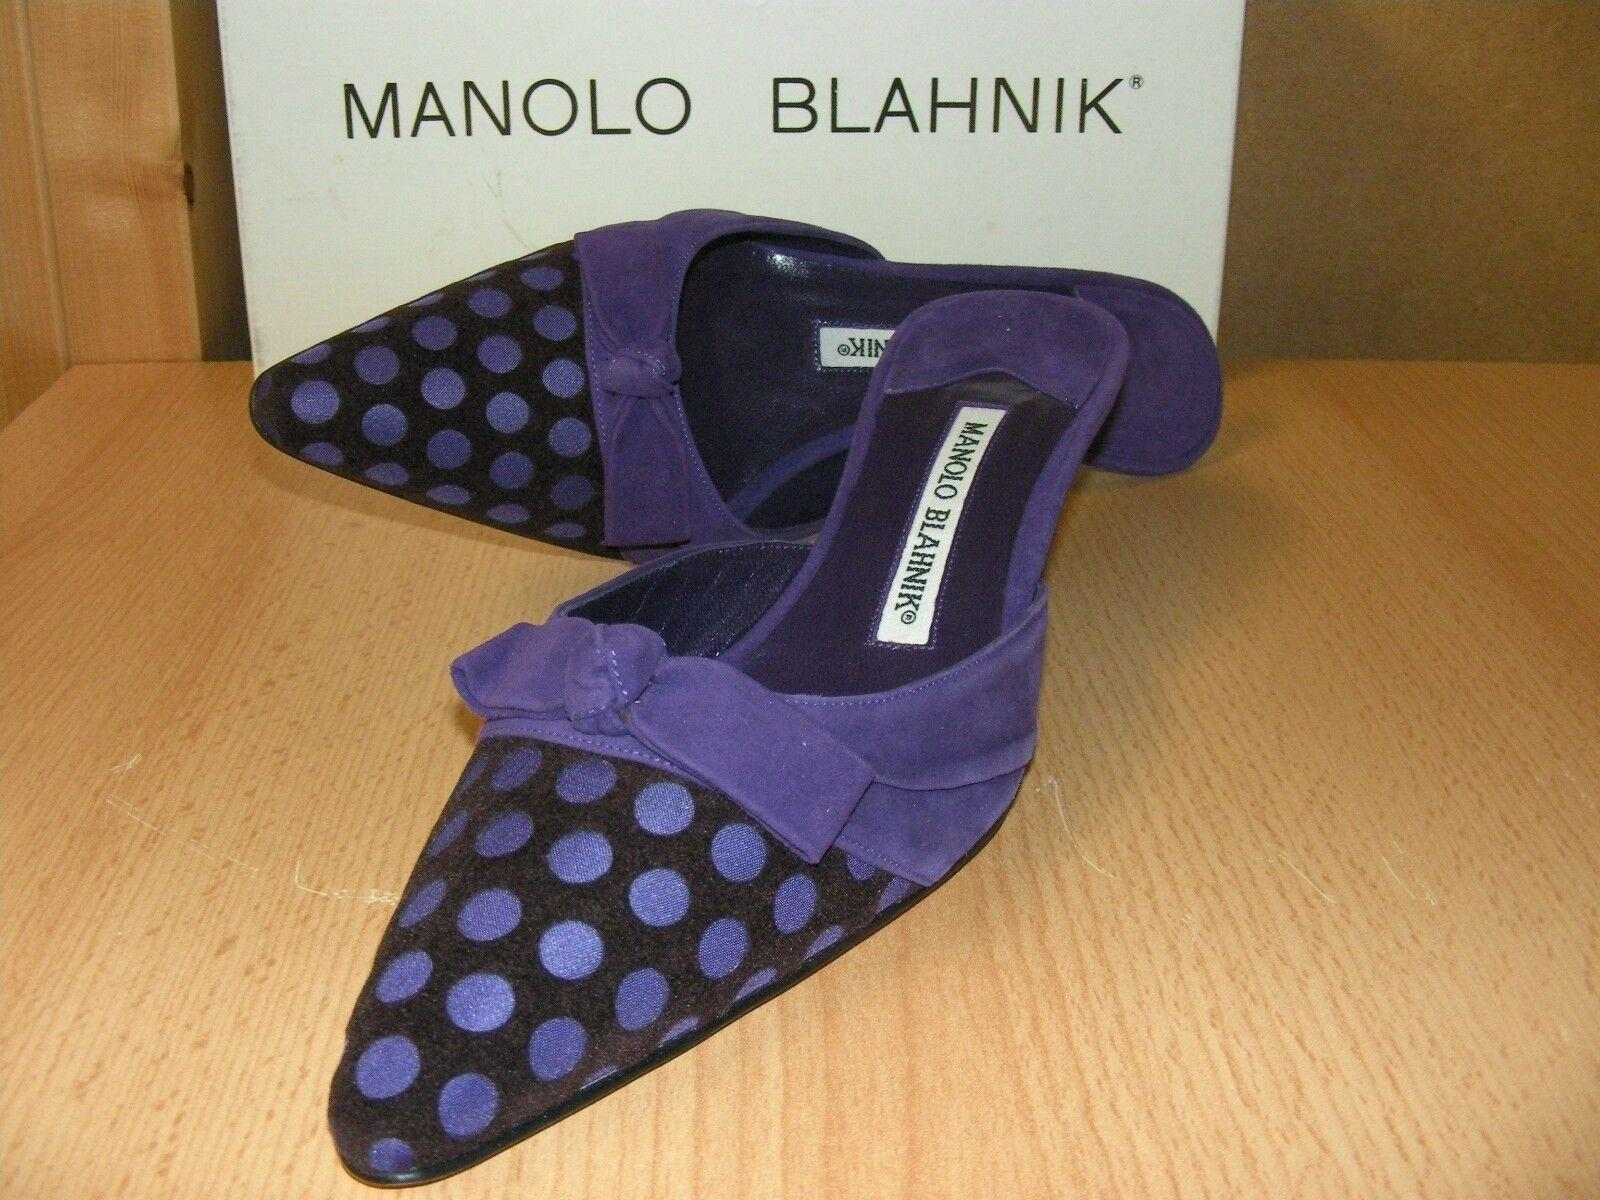 Pumps Manolo Blahnik Gr. 39,5 Modell Cnialo lila lila Polka Dots NEU mit Box